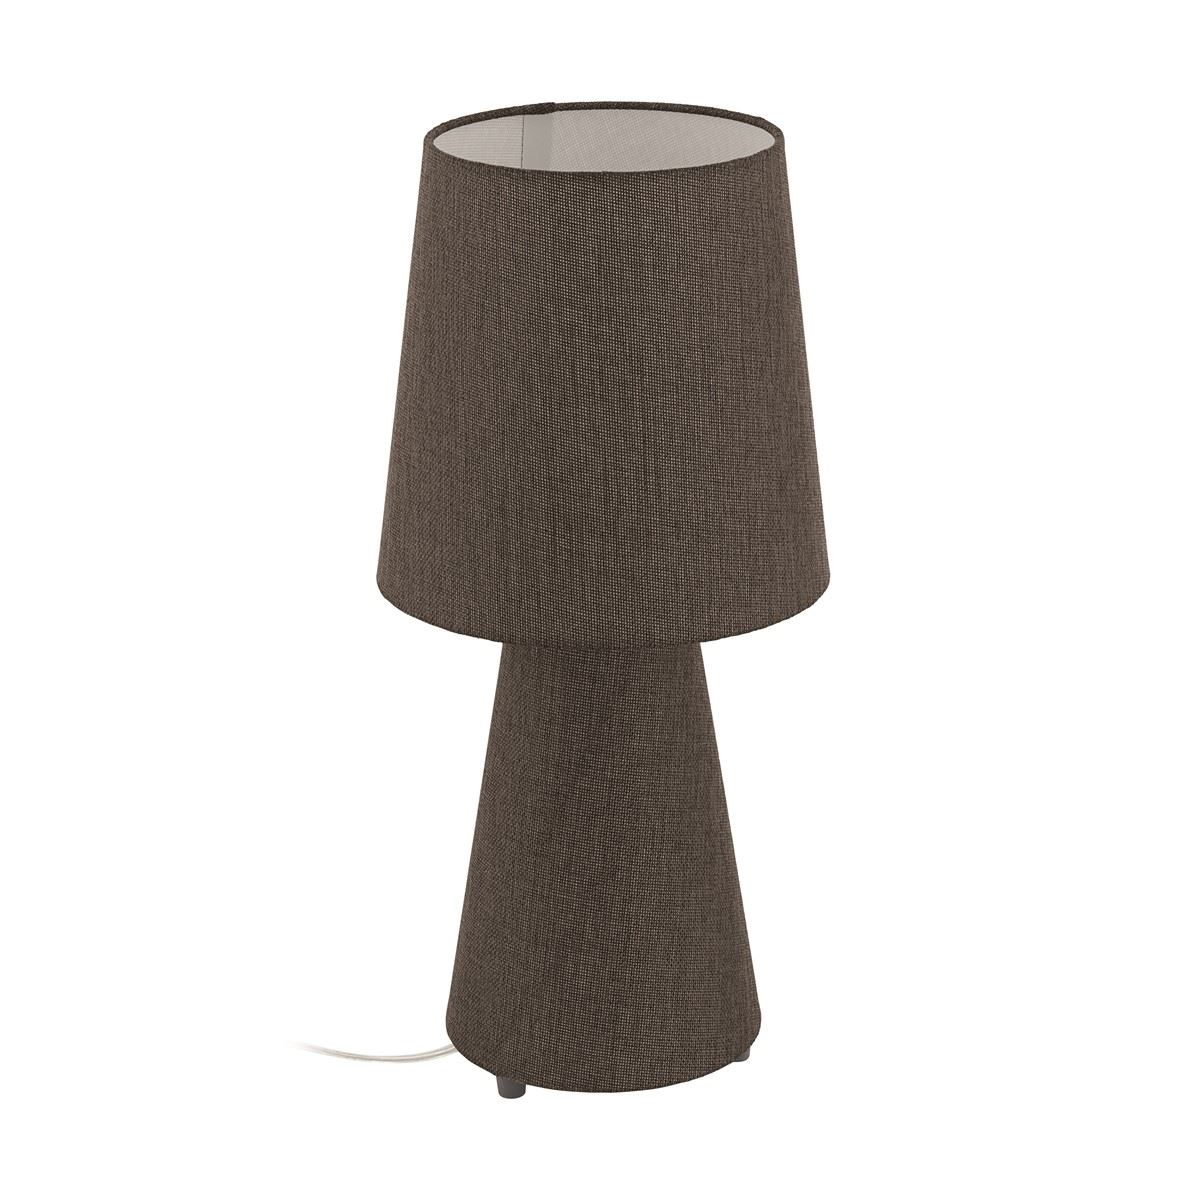 Carpara Brown Linen Table Lamp With Fabric Shades